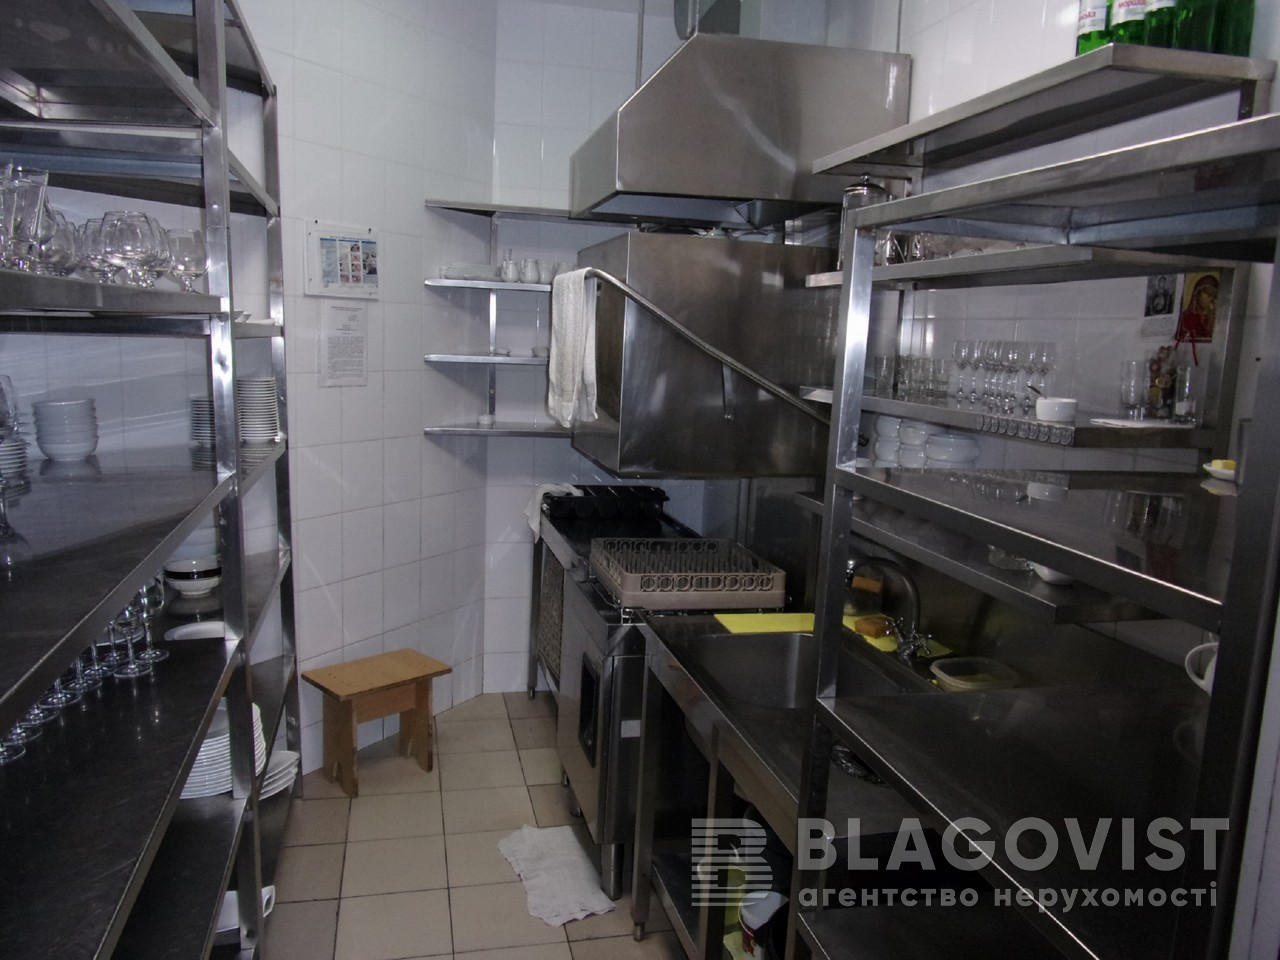 Ресторан, Z-236870, Днепропетровское шоссе, Киев - Фото 3